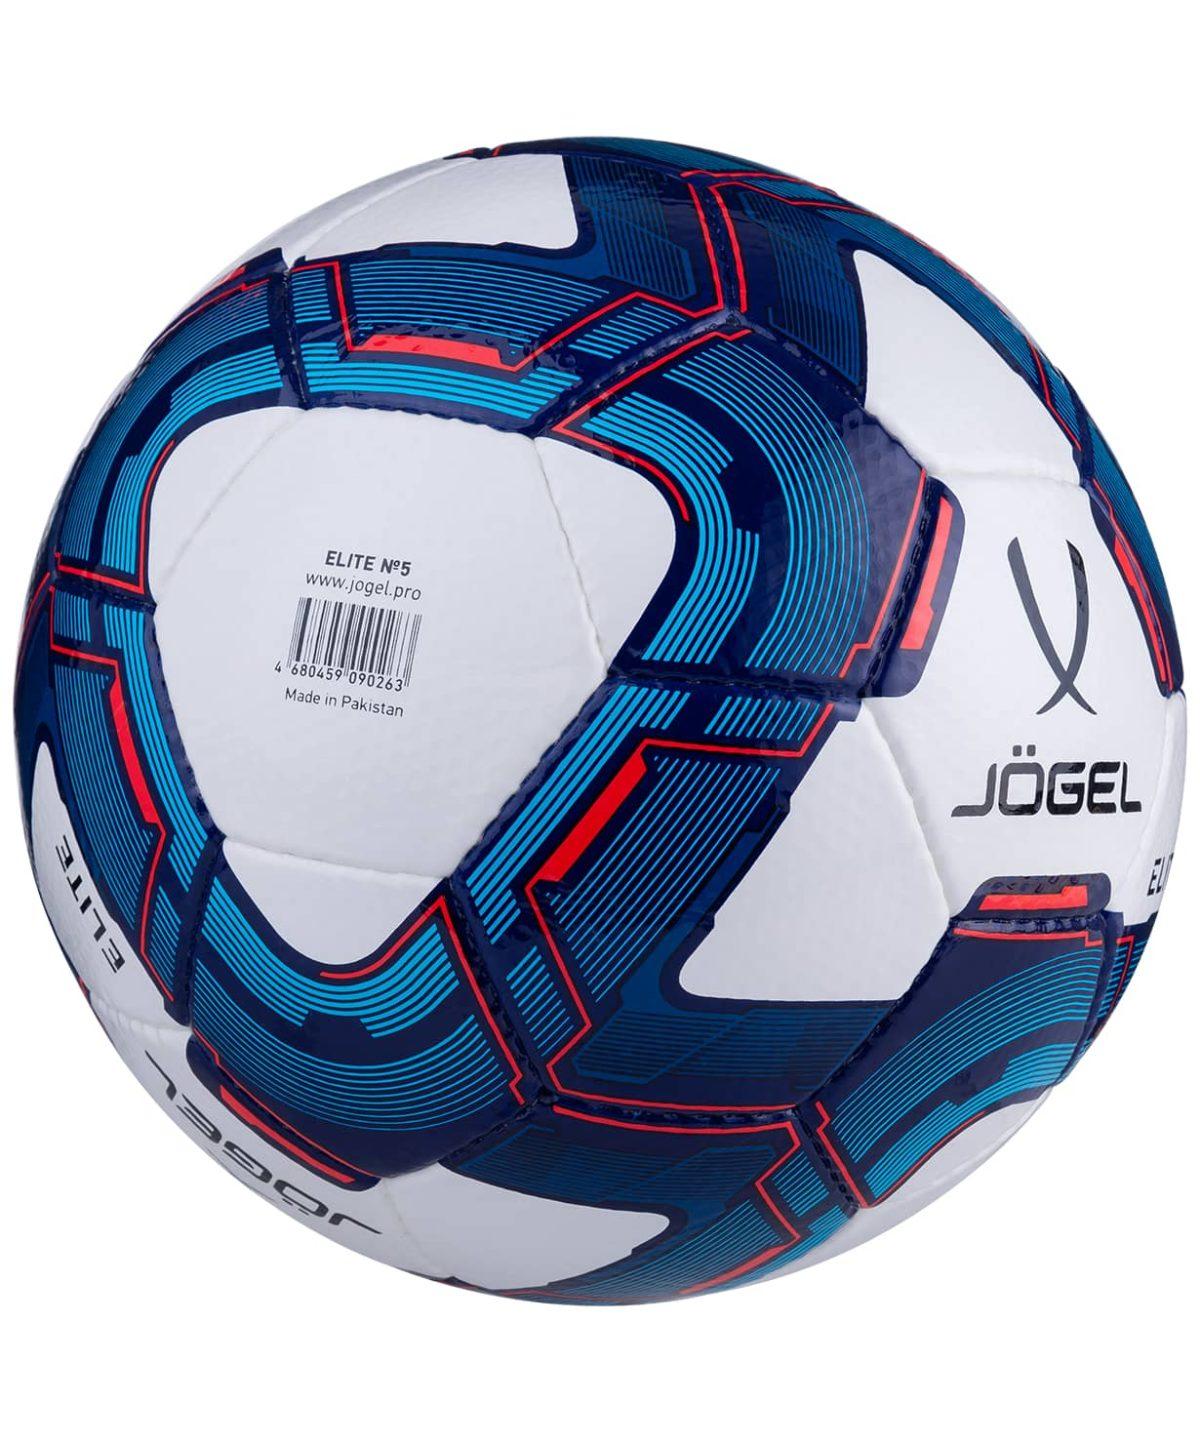 JOGEL Elite  Мяч футбольный  Elite №5 (BC20) - 5